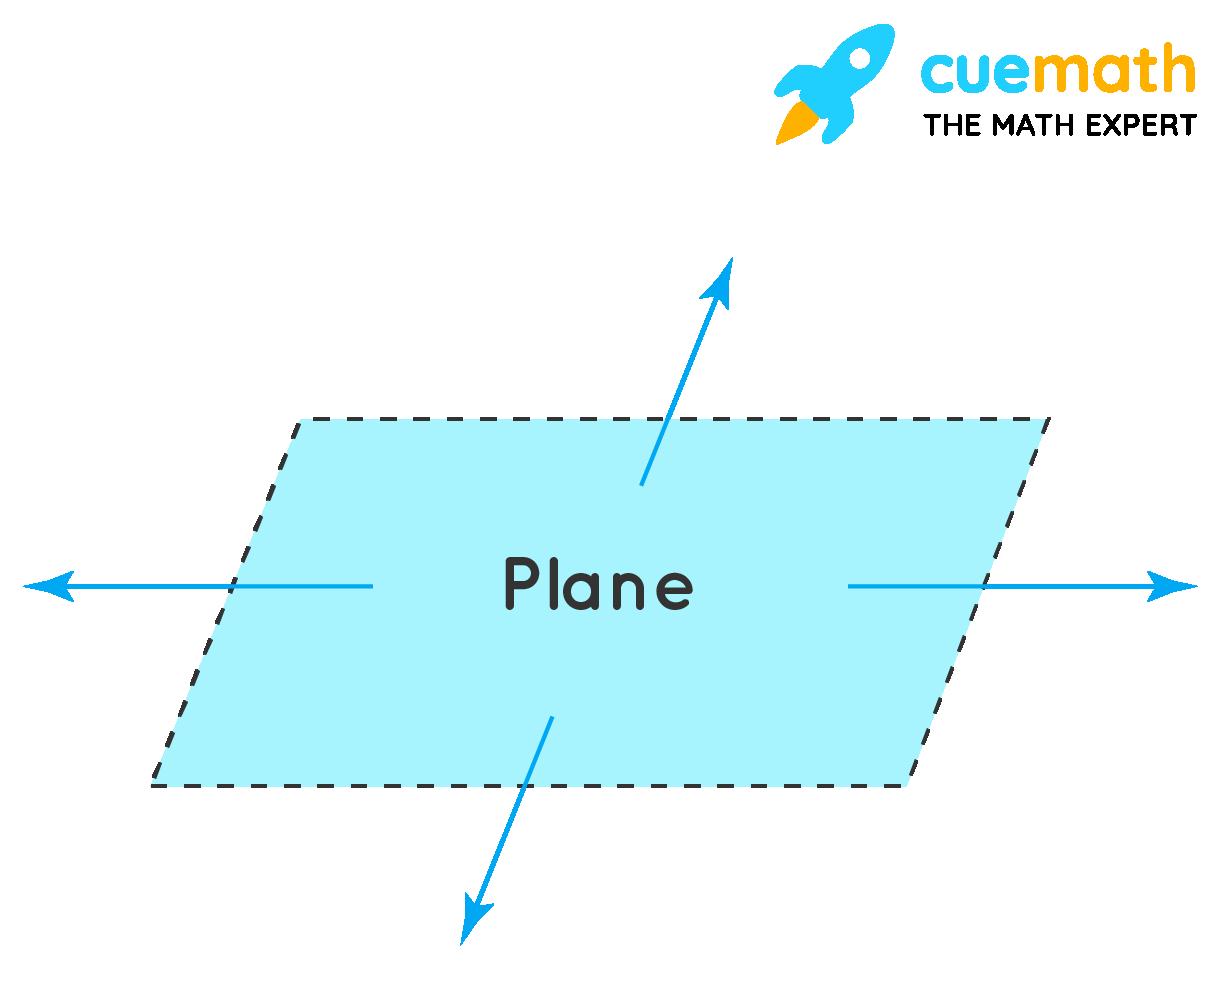 Plane definition